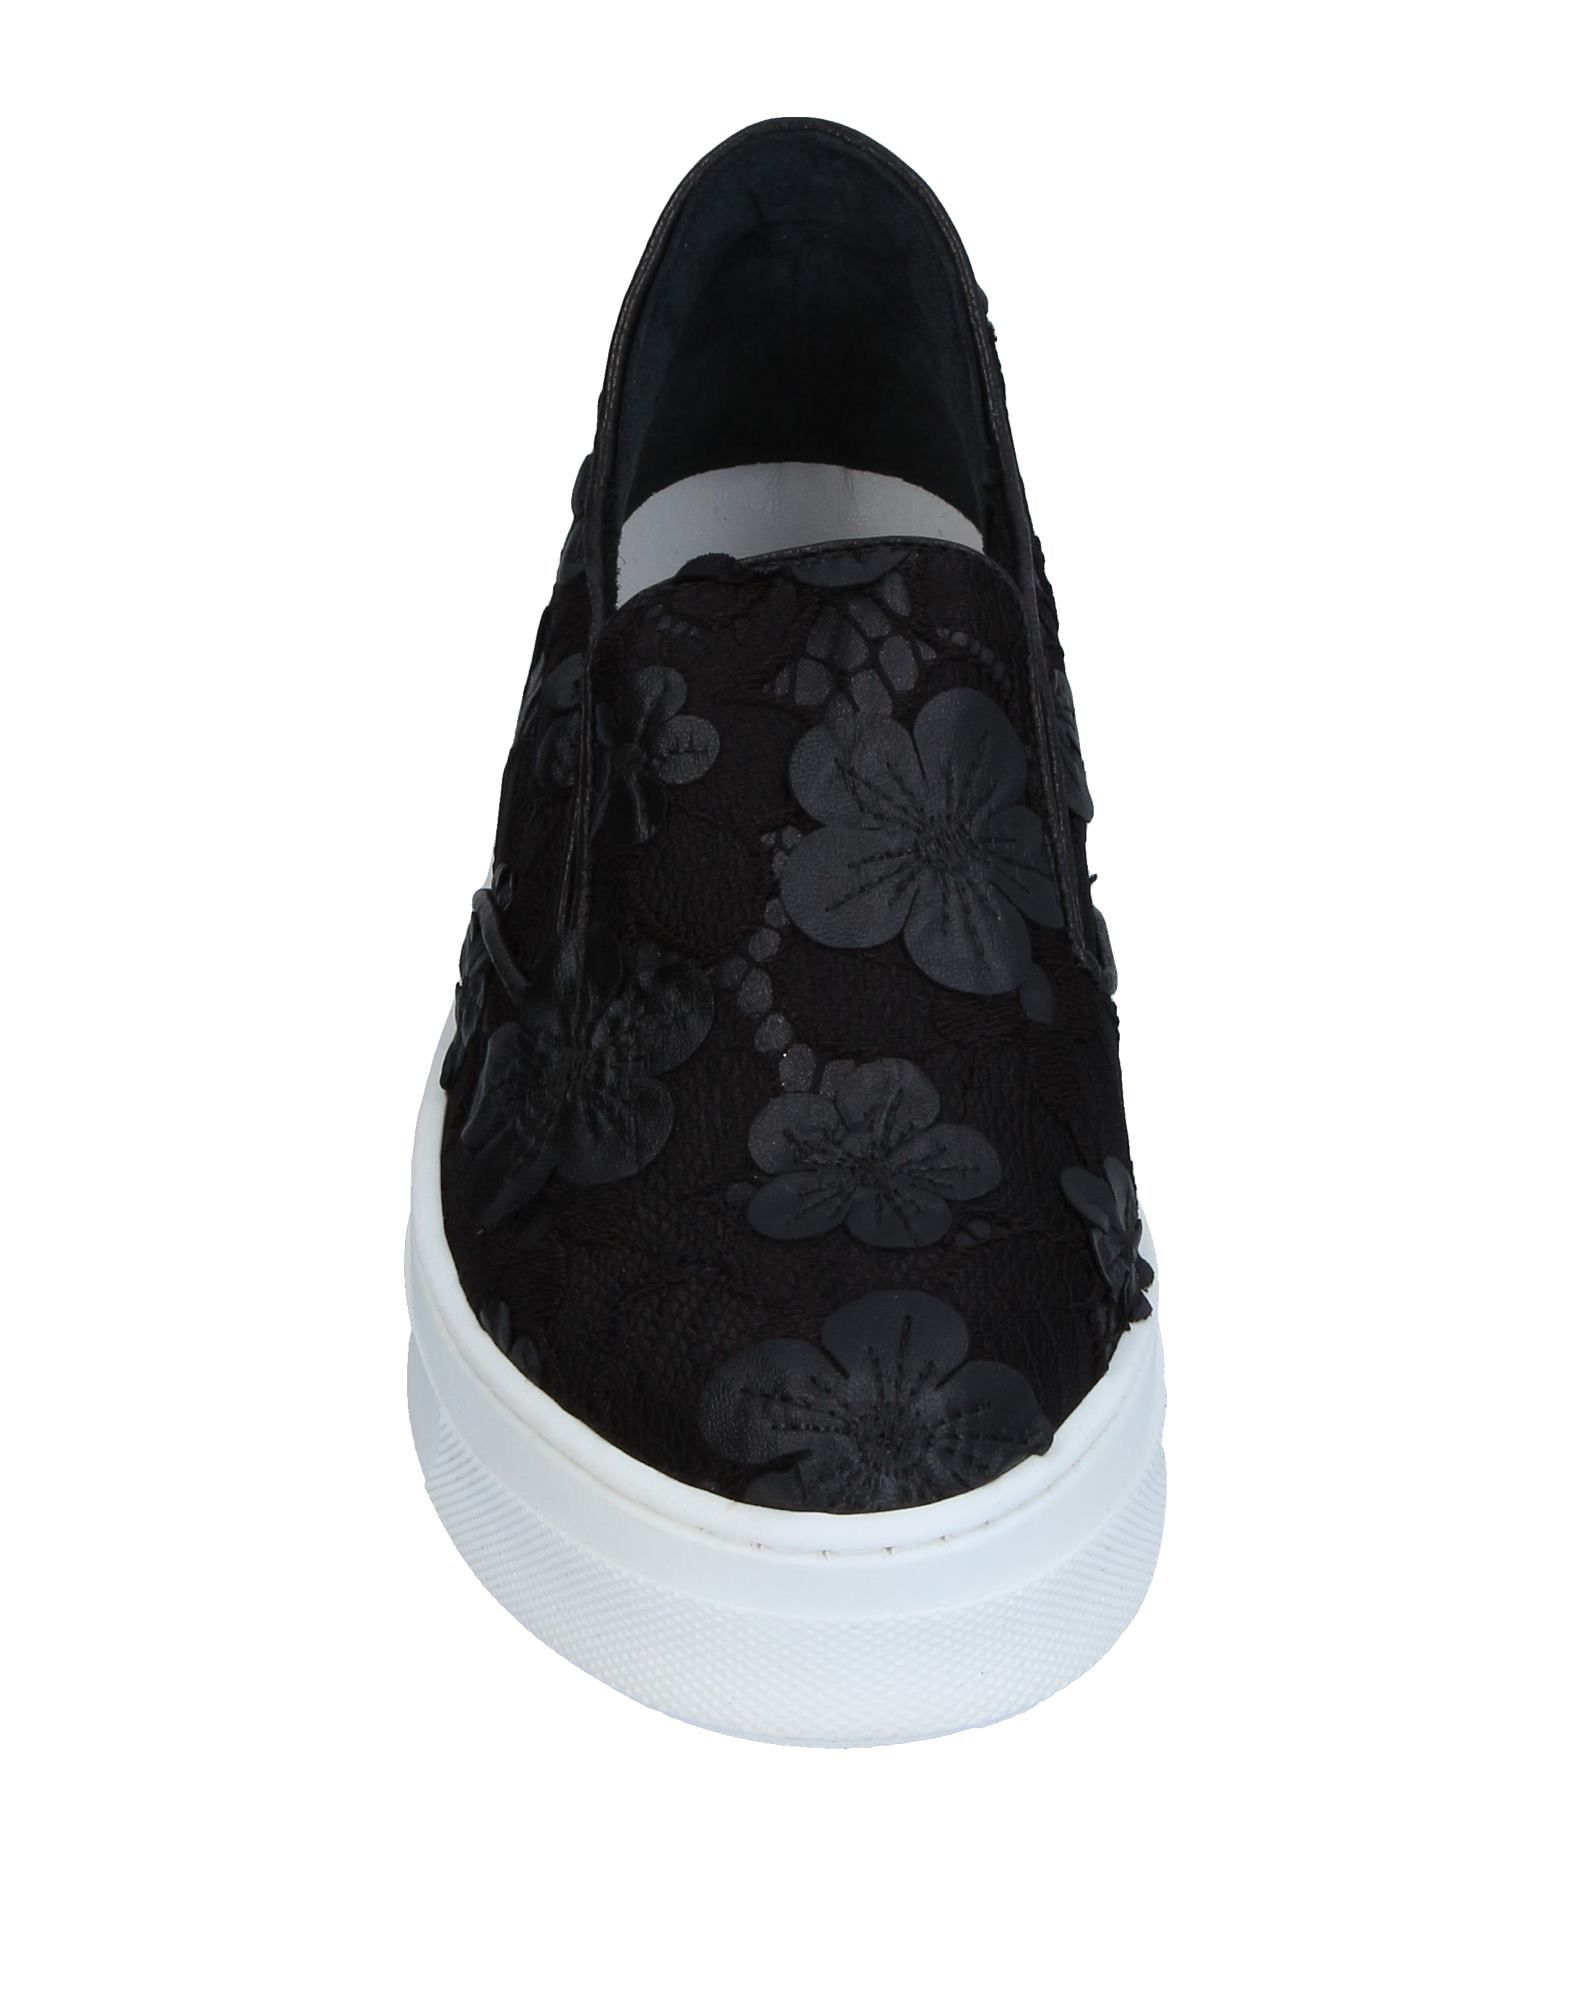 Sgn Giancarlo 11337024BS Paoli Sneakers Damen  11337024BS Giancarlo  332553